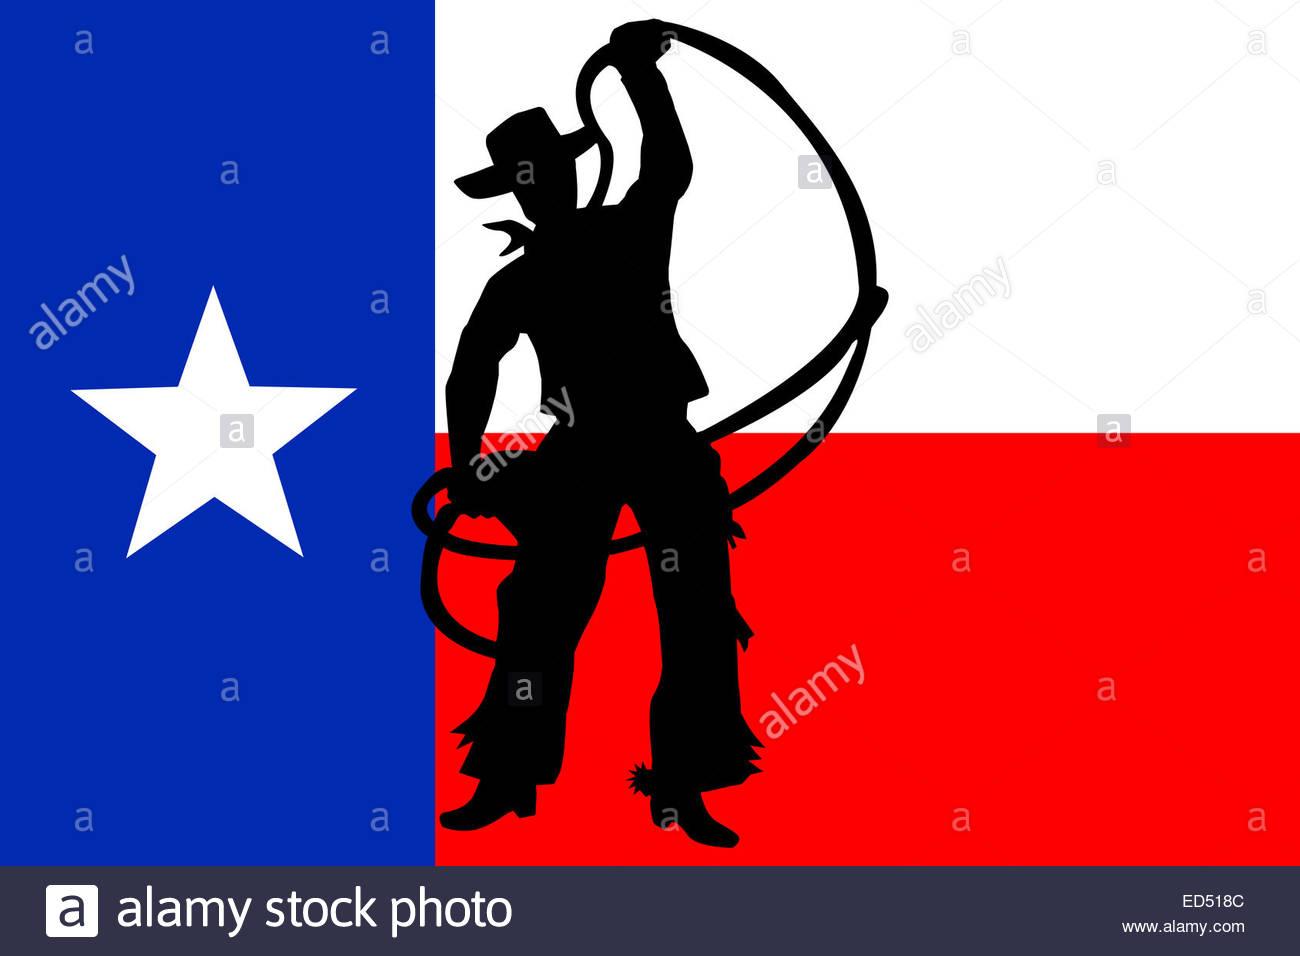 1300x956 Silhouette Of Cowboy Stock Photos Amp Silhouette Of Cowboy Stock